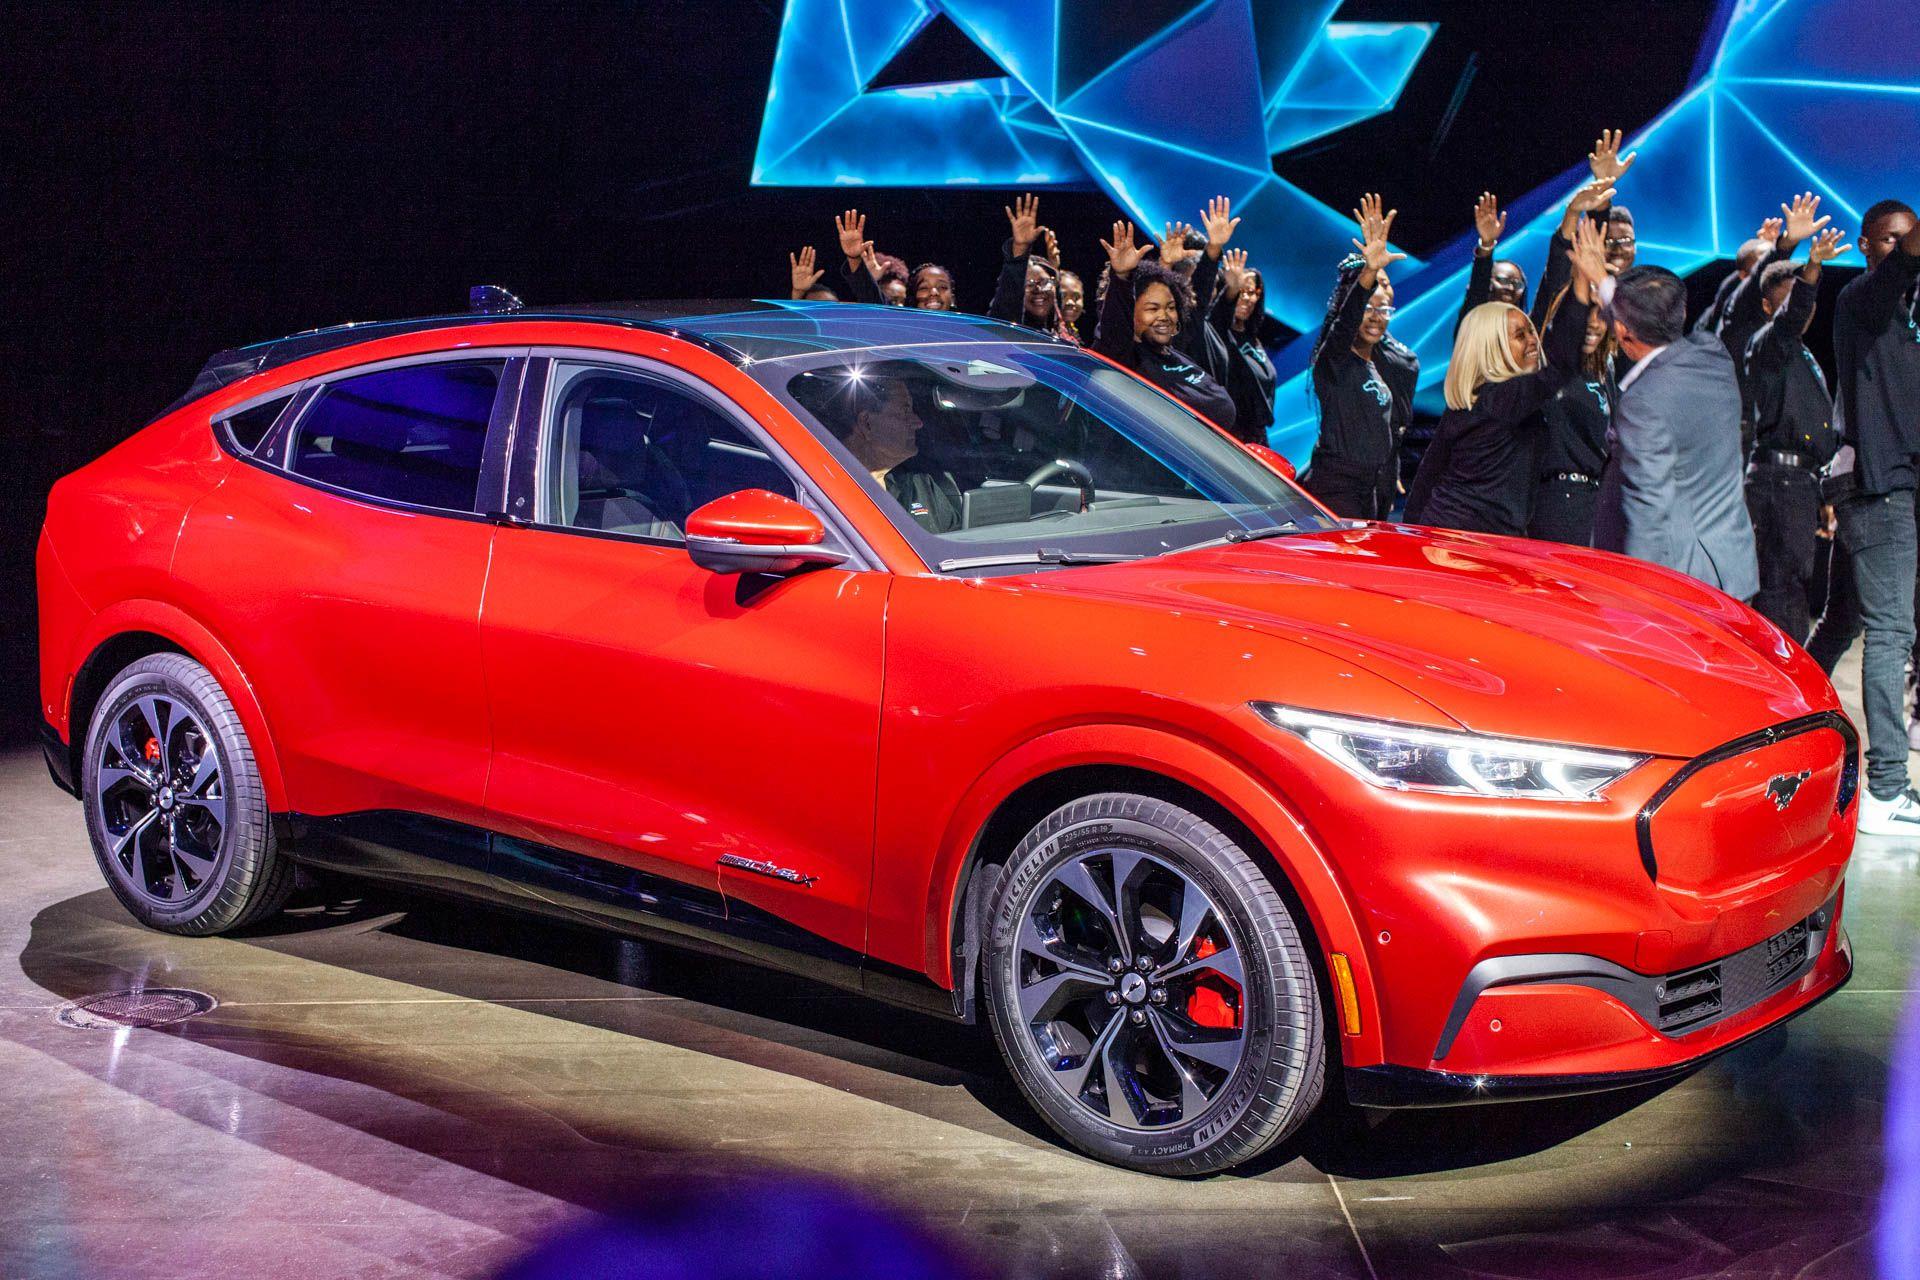 2021 Mustang Gt Convertible 0-60